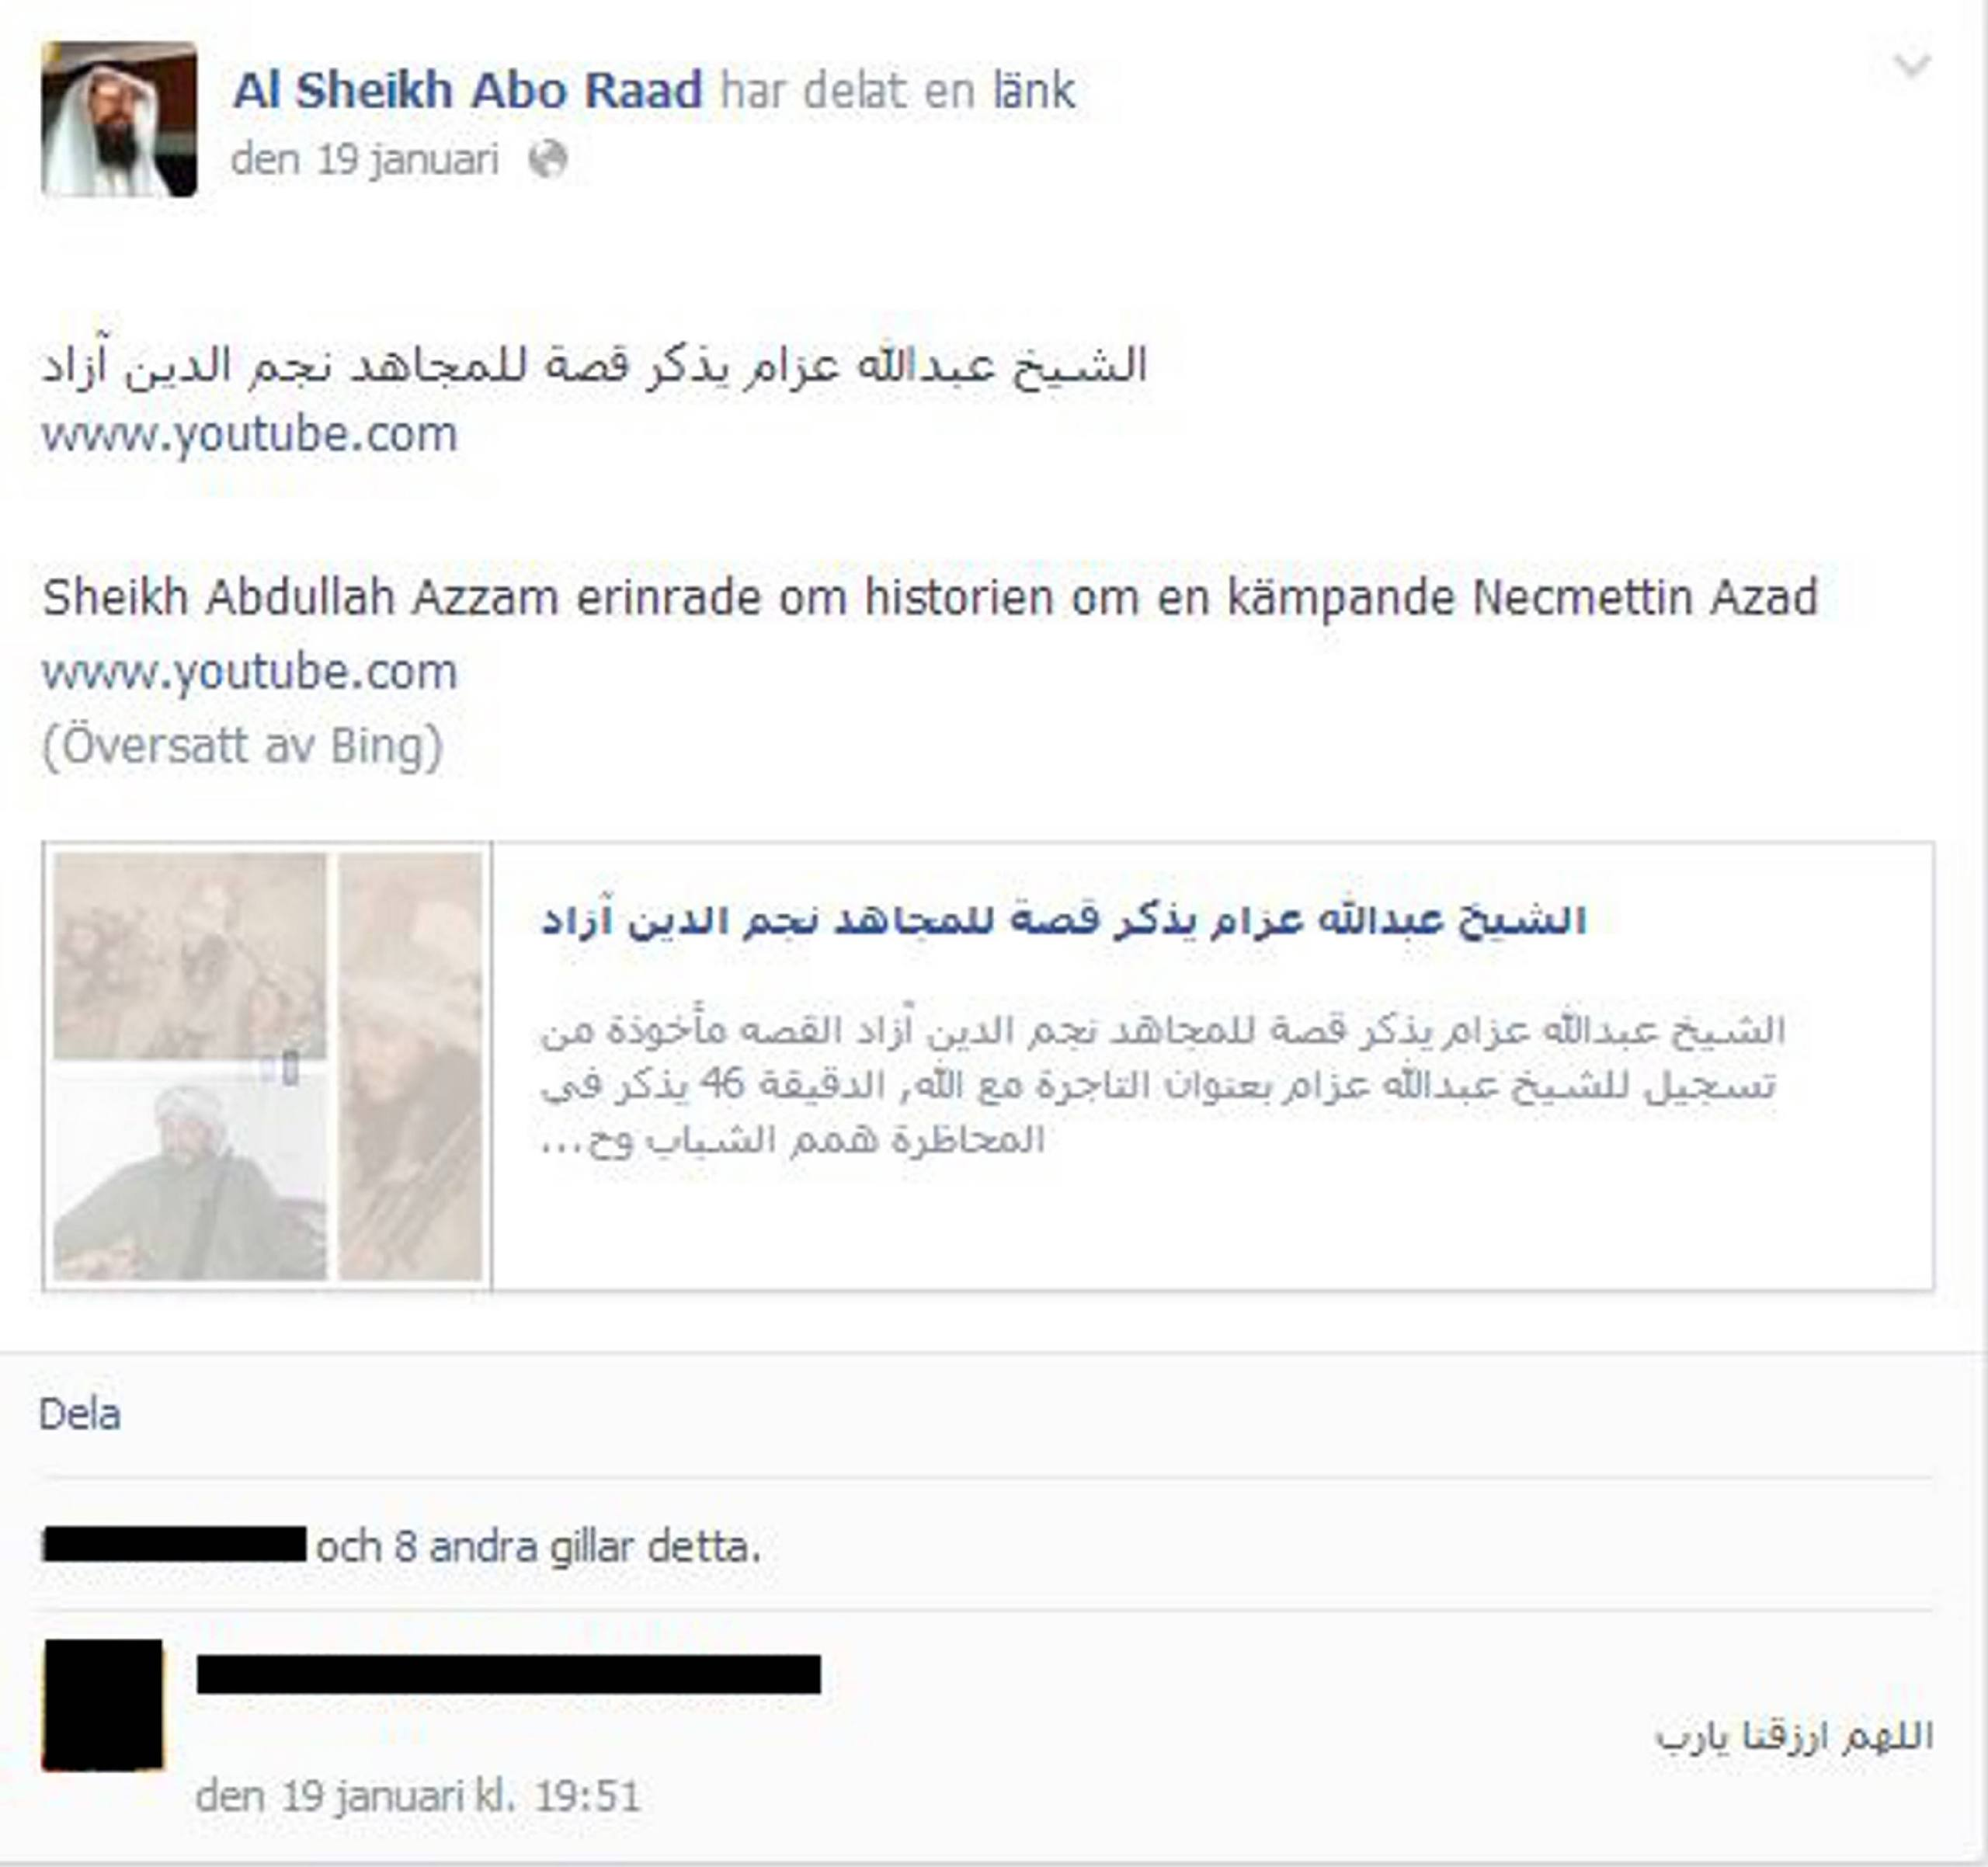 abo jihad frågor